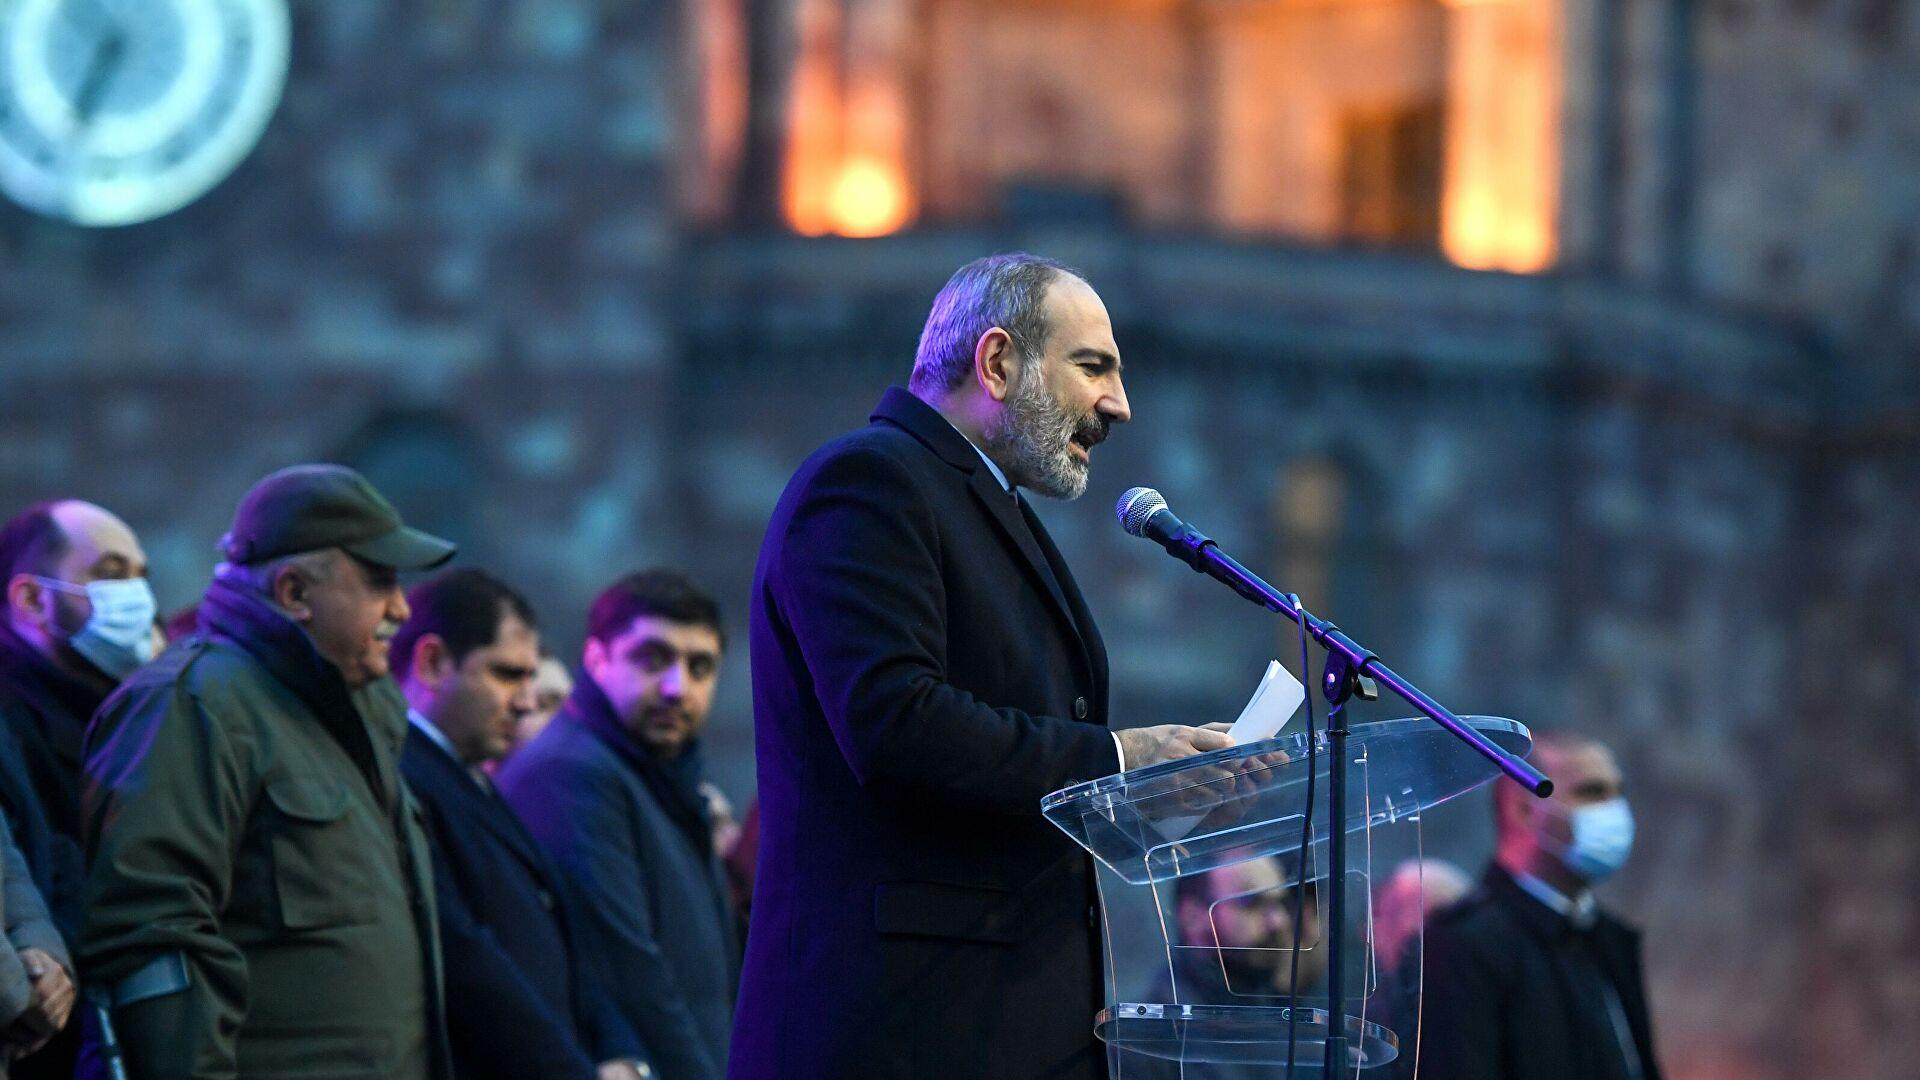 Пашинян анонсировал план решения ситуации на границе с Азербайджаном